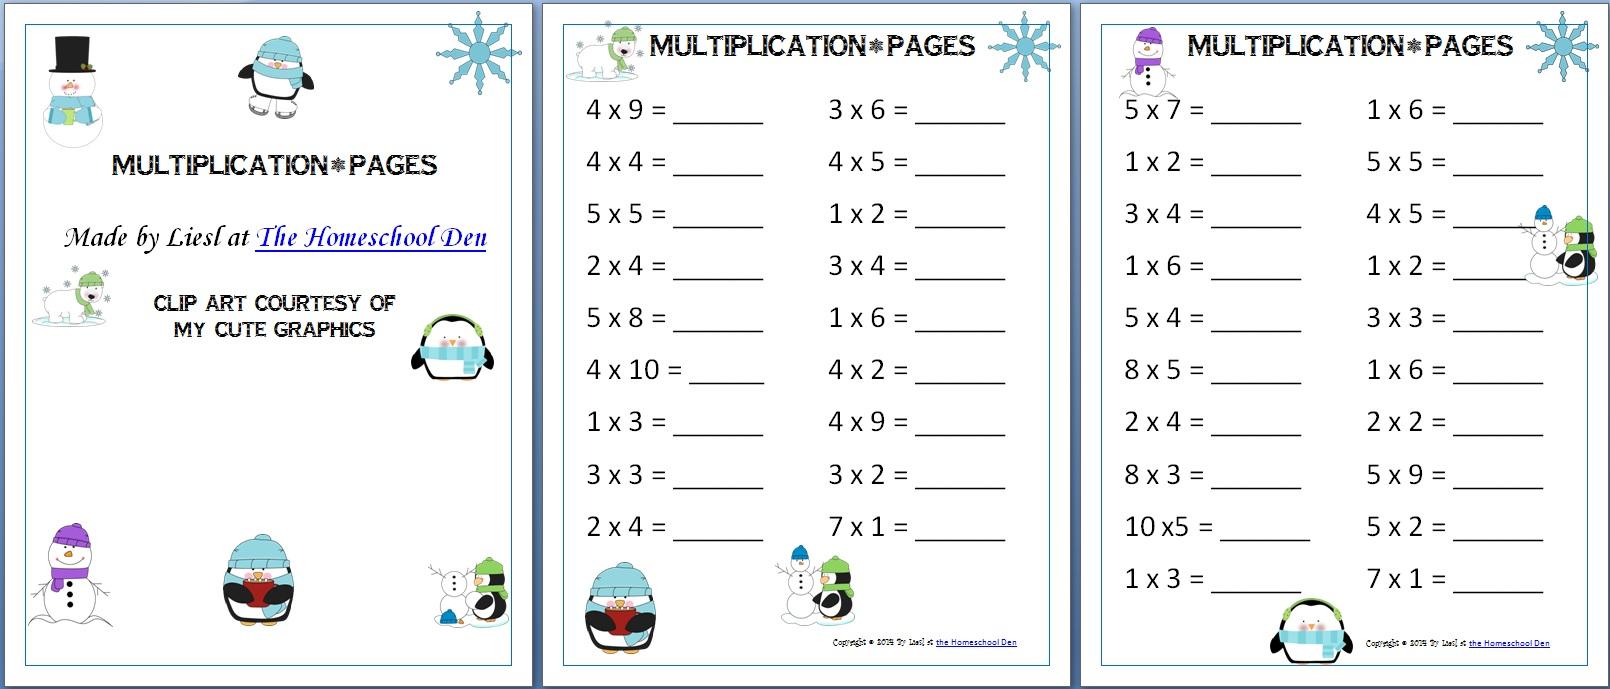 Free Multiplication Worksheets Archives